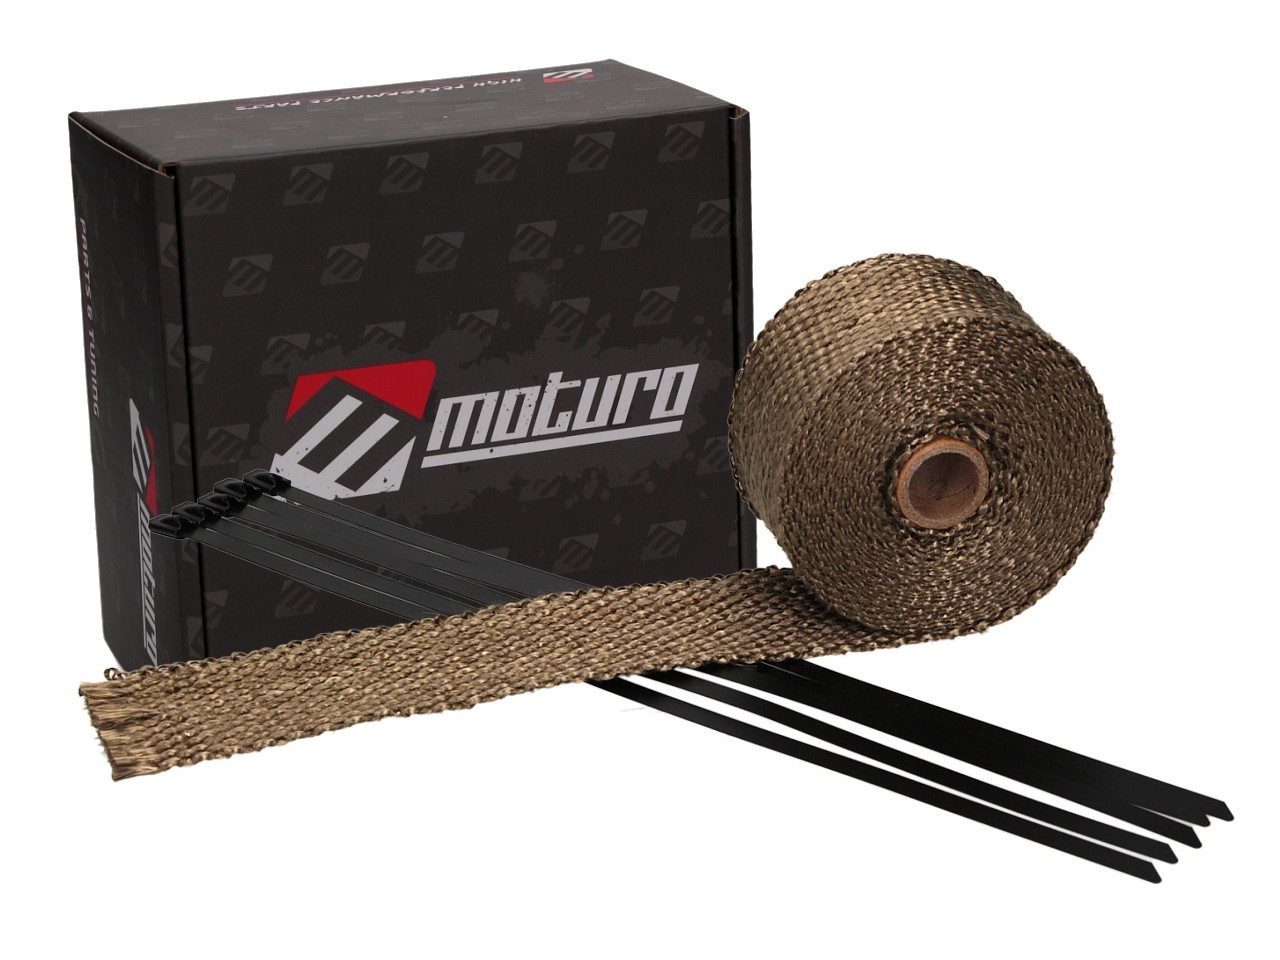 Moturo Hitzeschutzband 5m Titanium inkl. 5 Metall-Kabelbinder ...